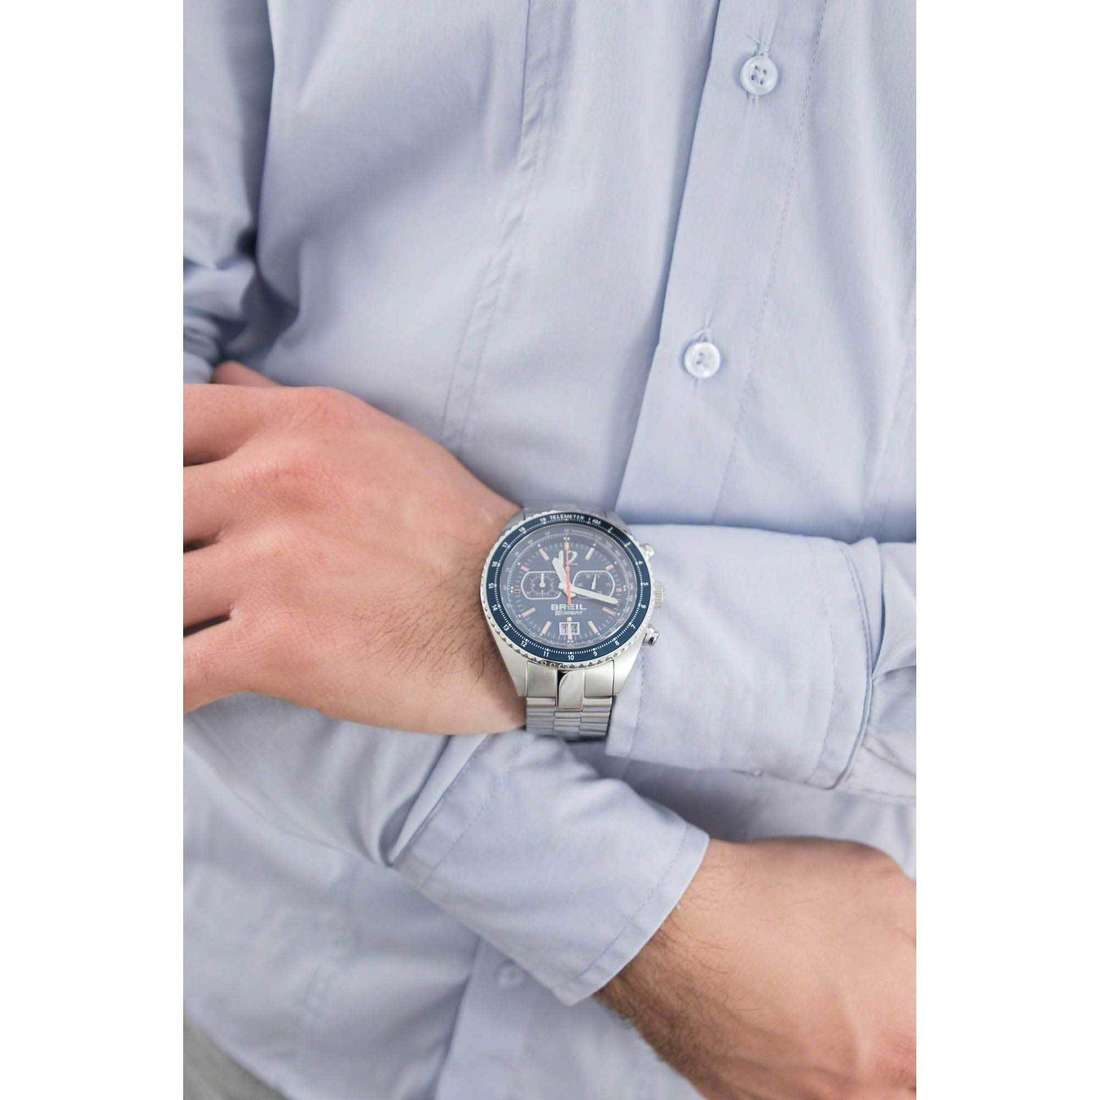 Breil cronografi Midway uomo TW1449 indosso